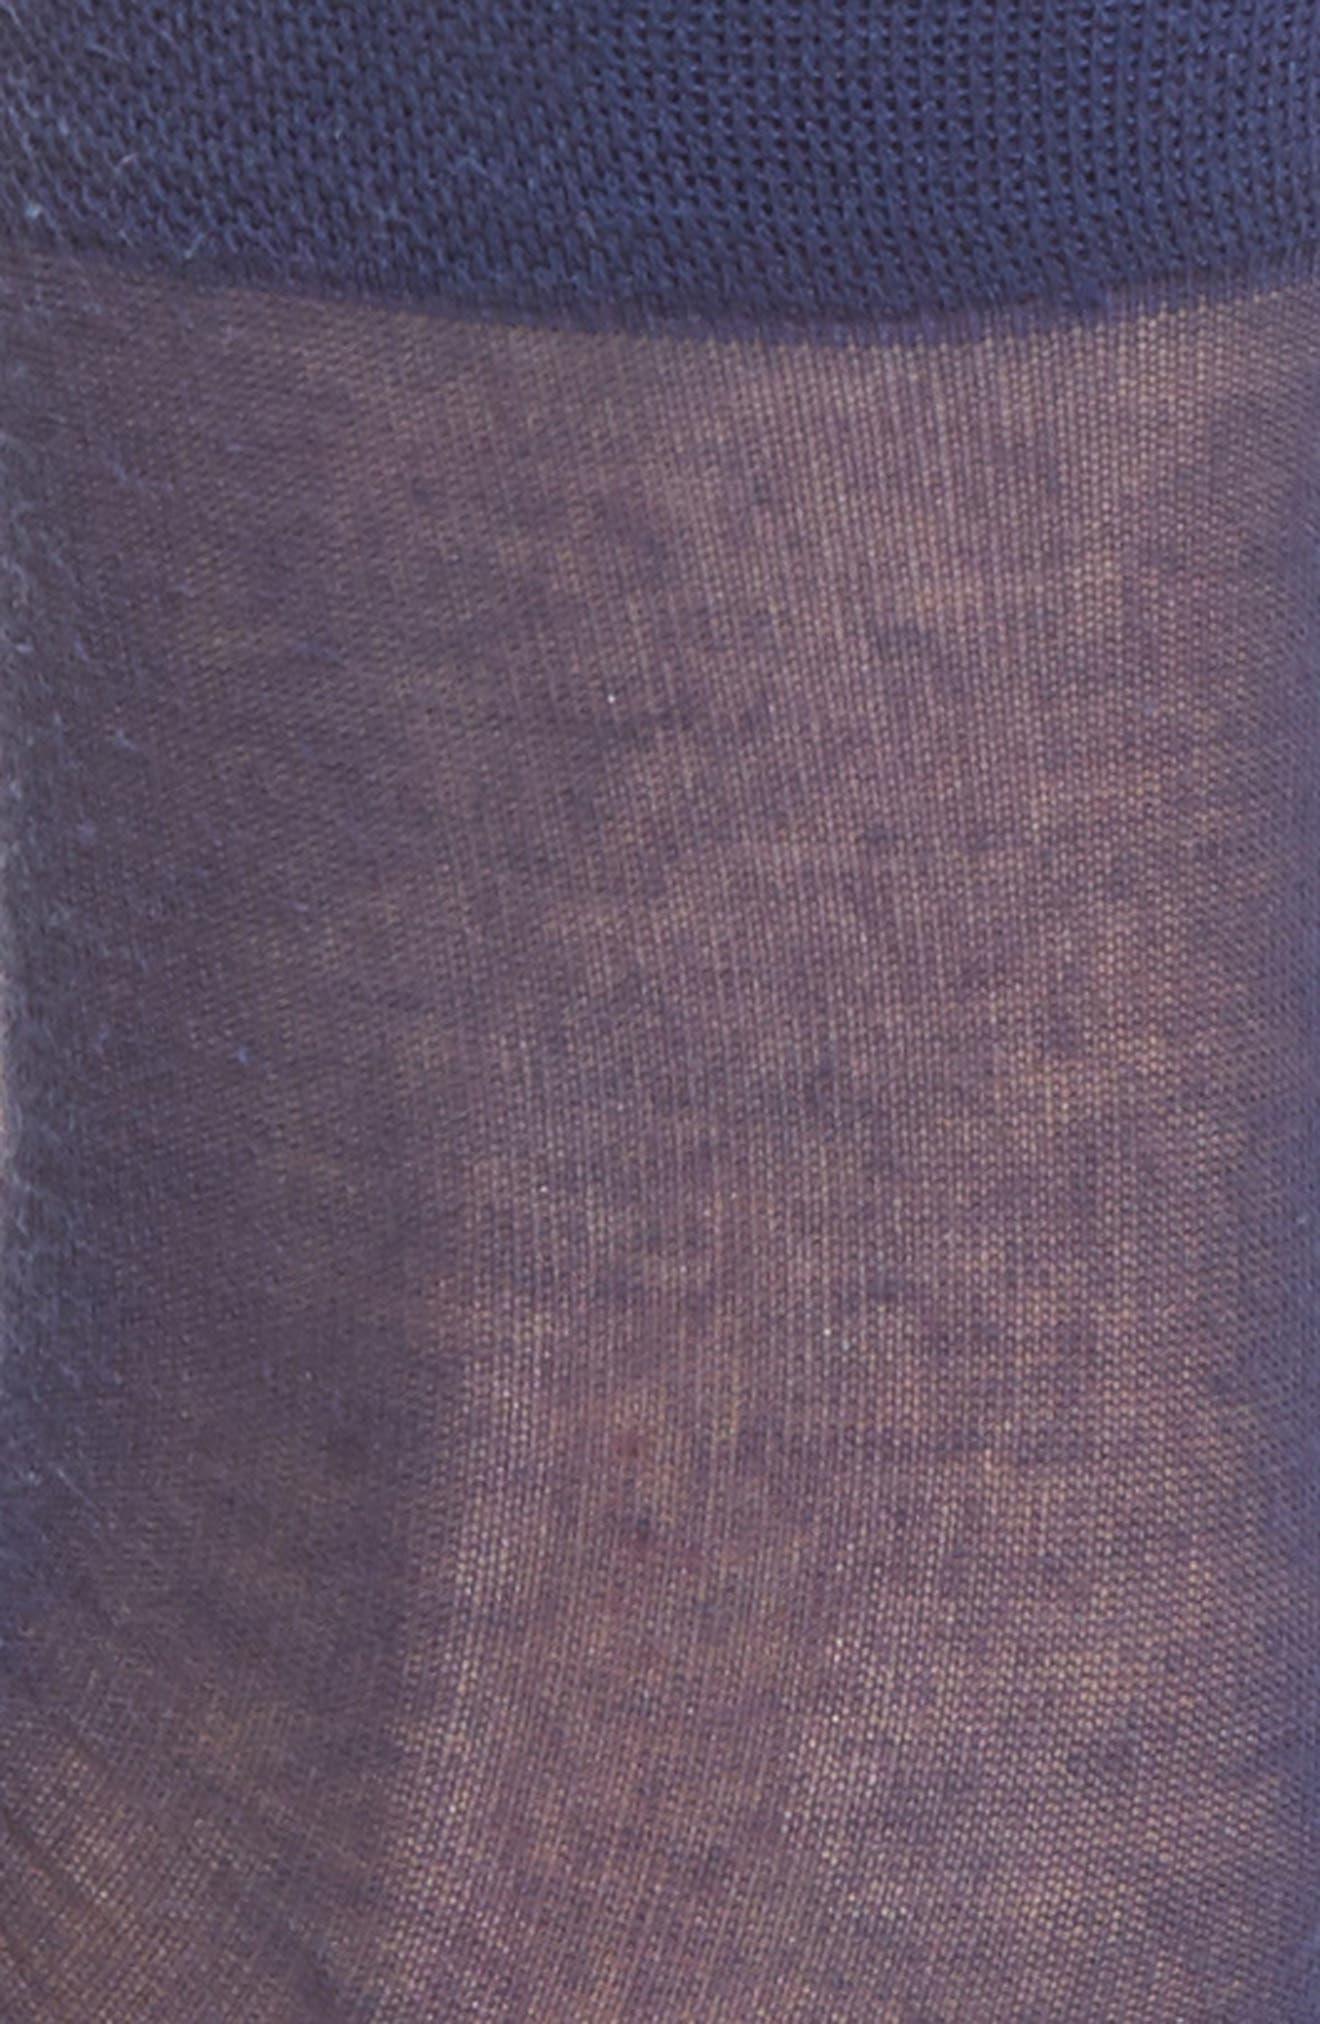 Sheer Crew Socks,                             Alternate thumbnail 2, color,                             411